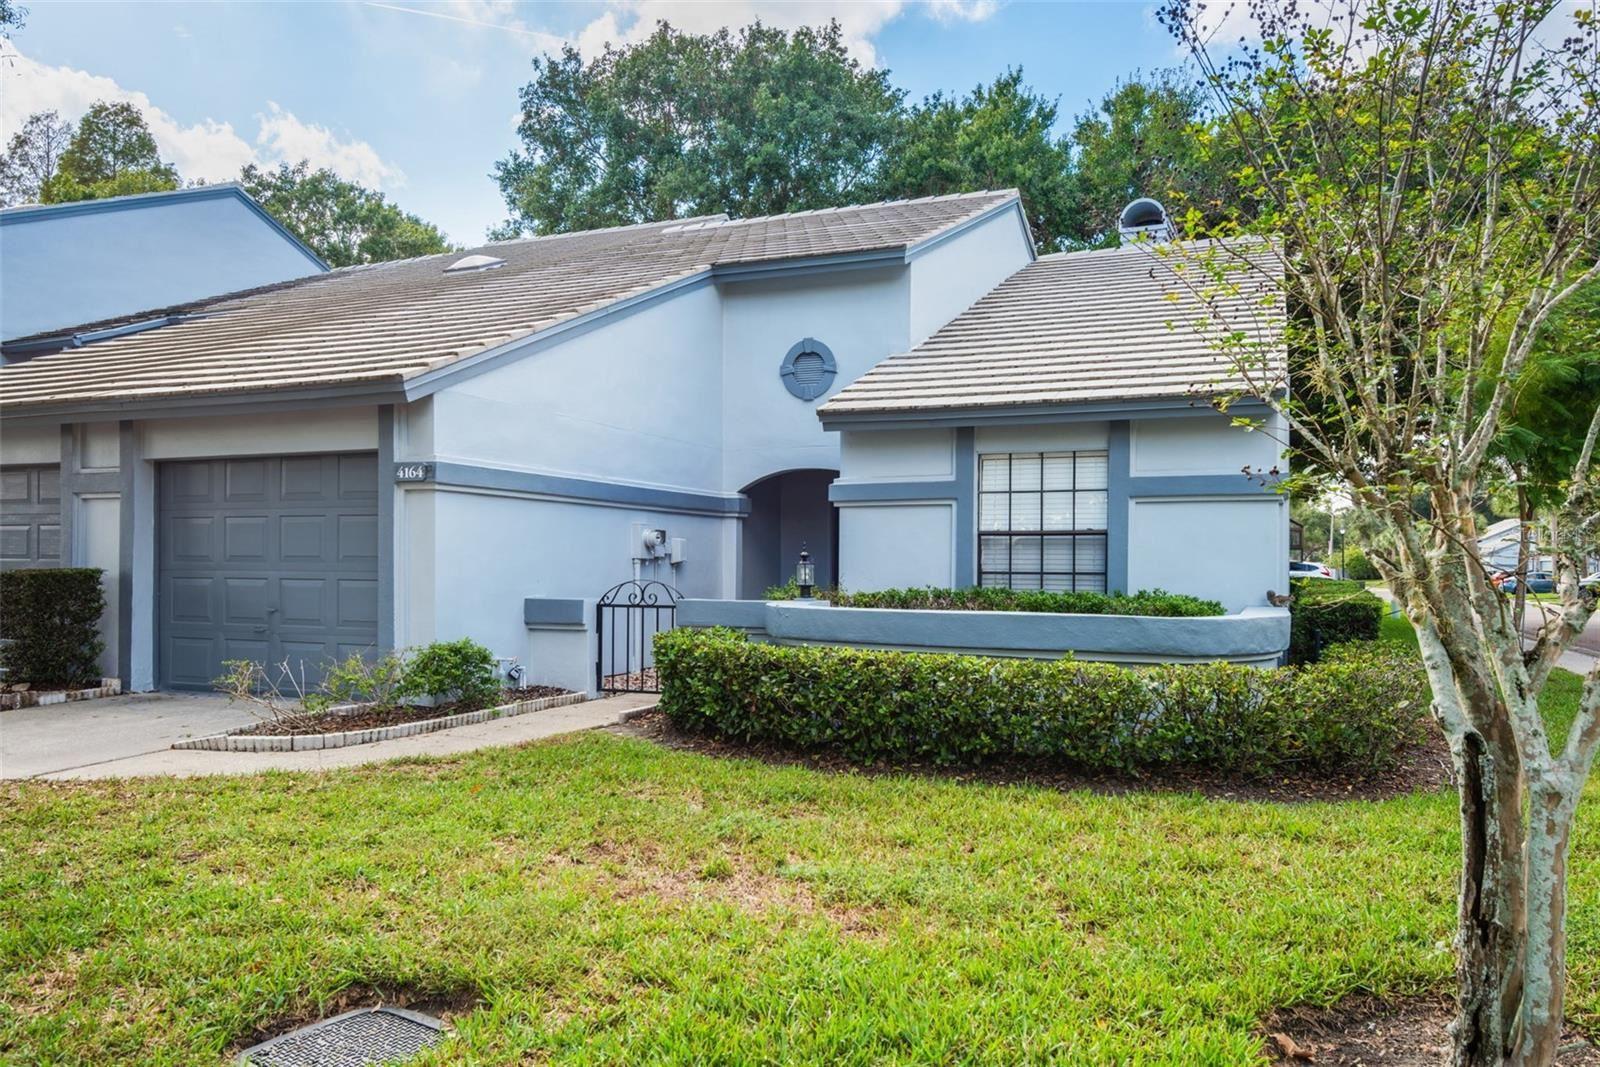 4164 BRENTWOOD PARK CIRCLE, Tampa, FL 33624 - MLS#: T3336883